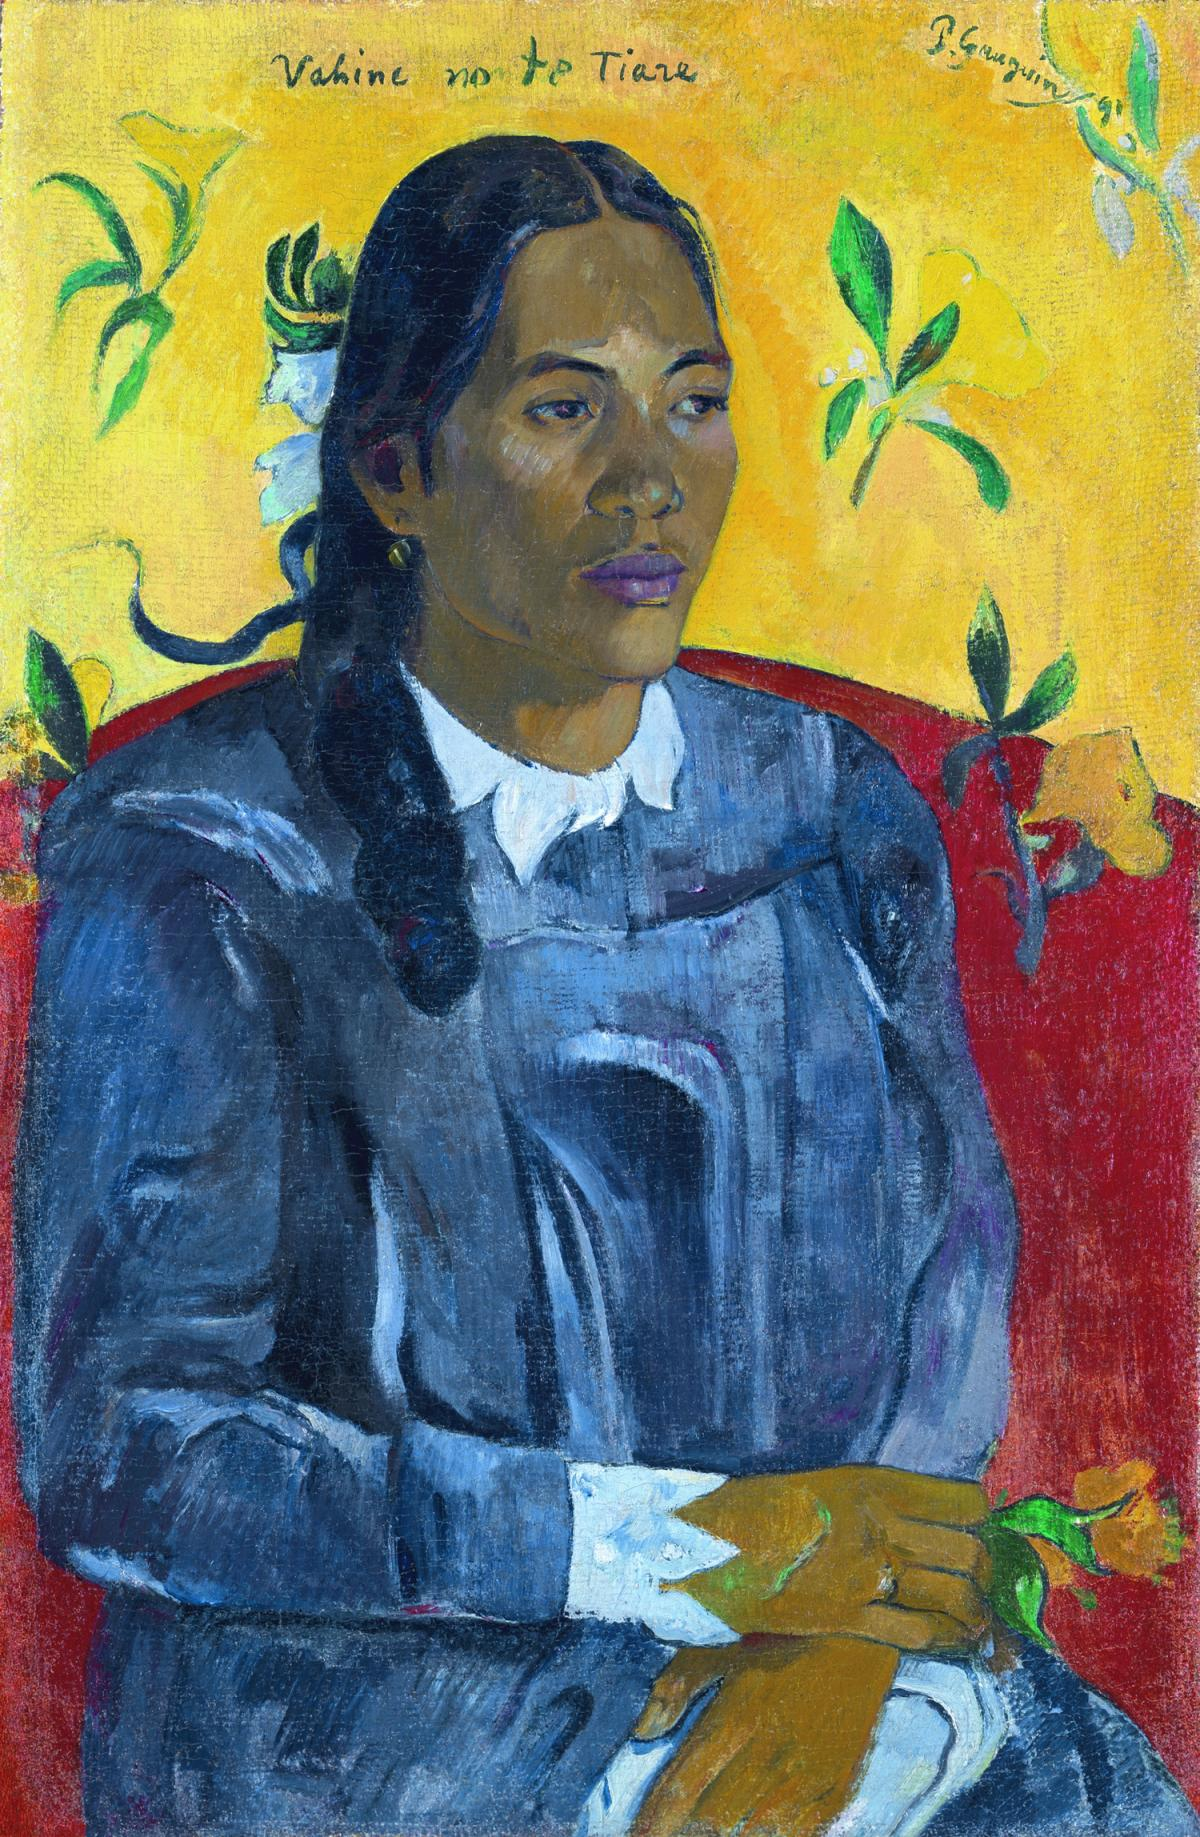 Tahitian Woman with a Flower, Paul Gauguin, 1891 (Image courtesy of NY Carlsberg Glyptotek)